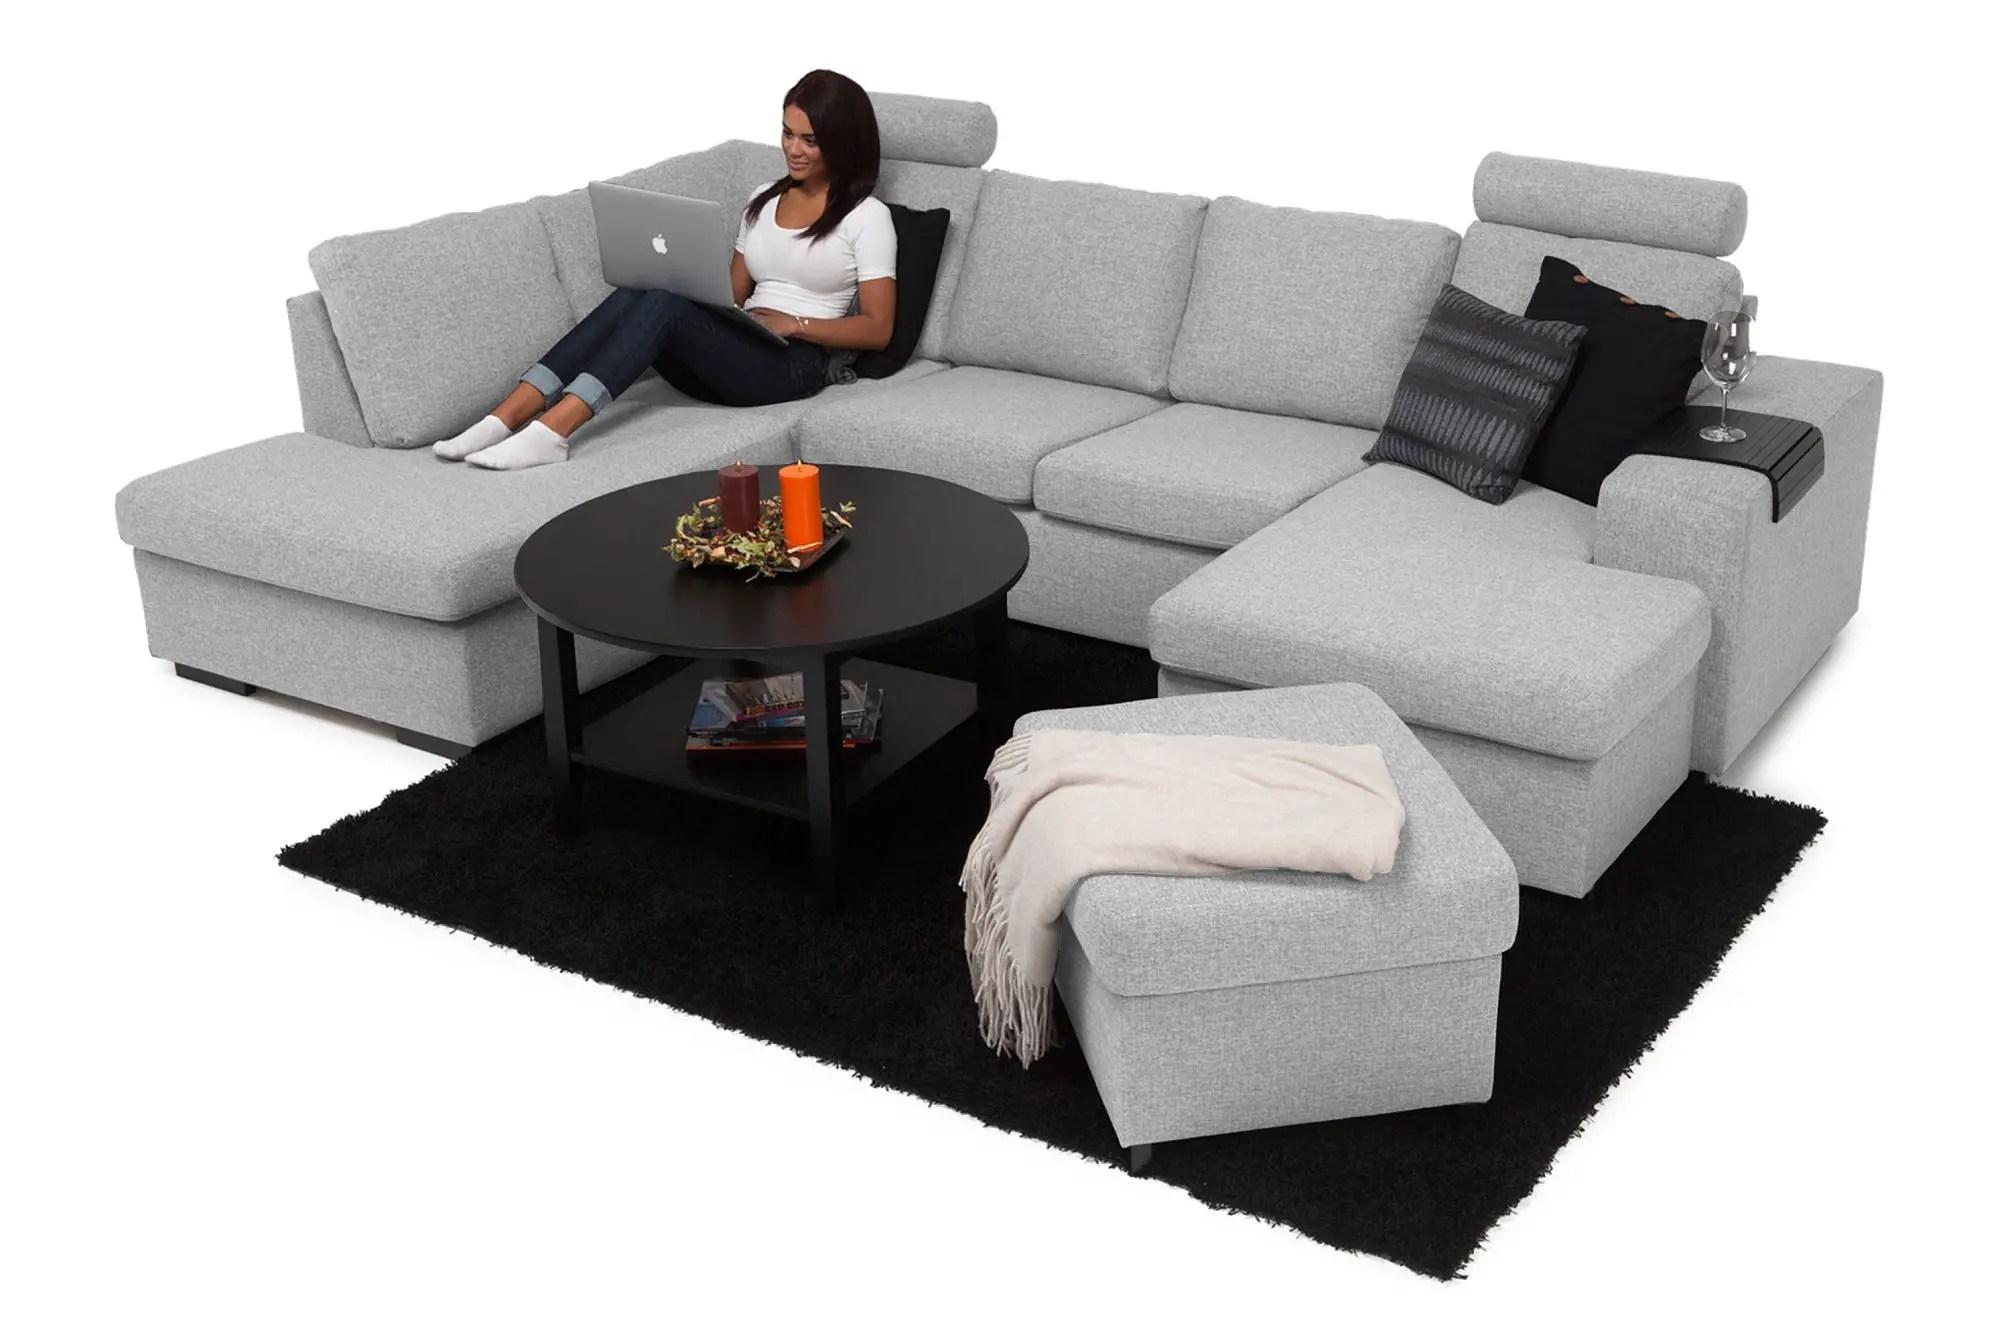 Fullsize Of U Shaped Couch